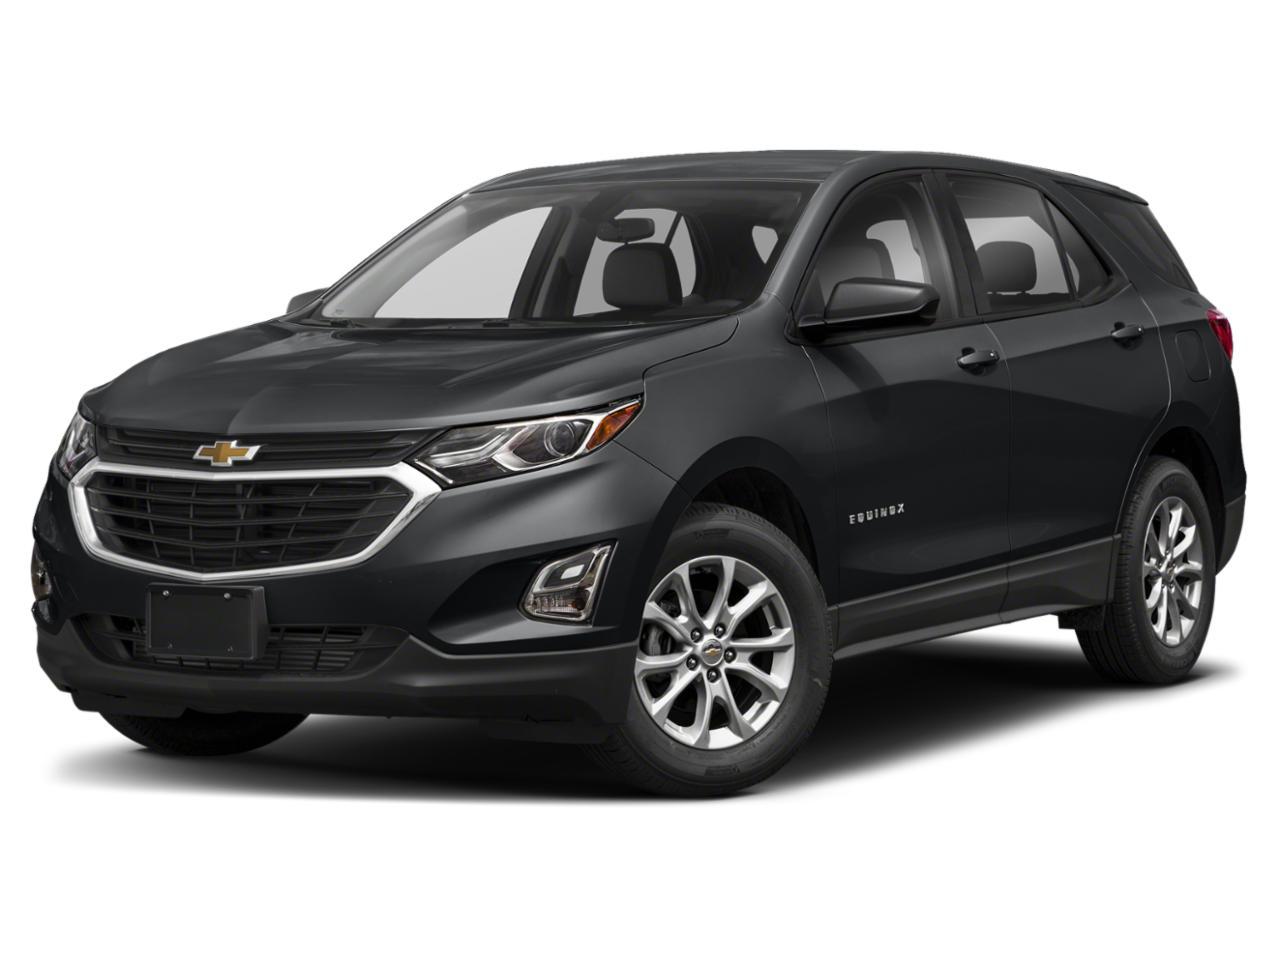 2019 Chevrolet Equinox Vehicle Photo in Norfolk, VA 23502